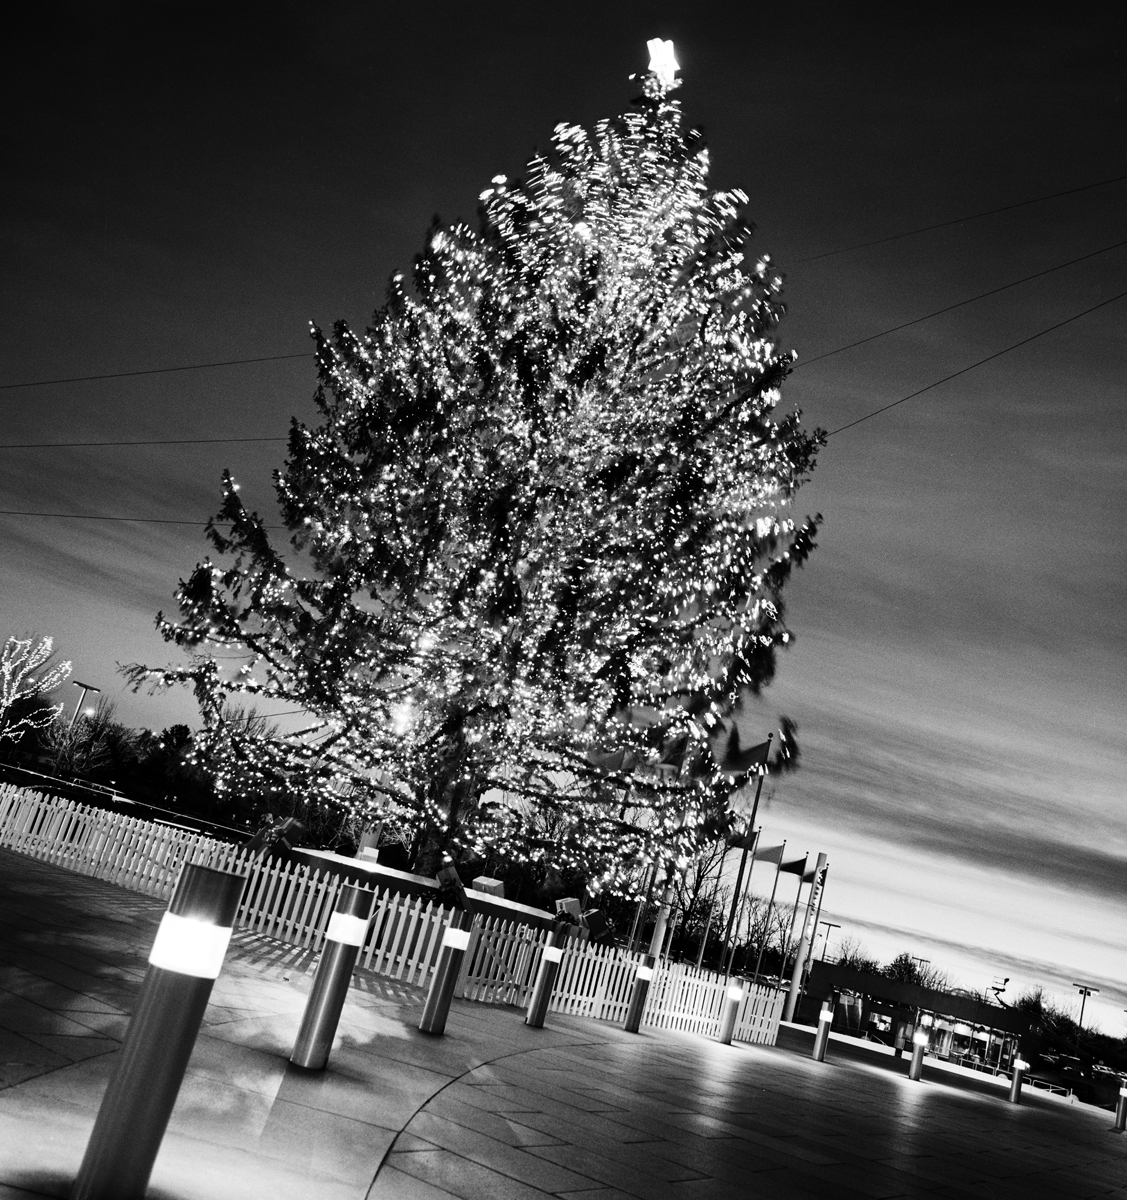 Eab Plaza tree 8 bit final.jpg